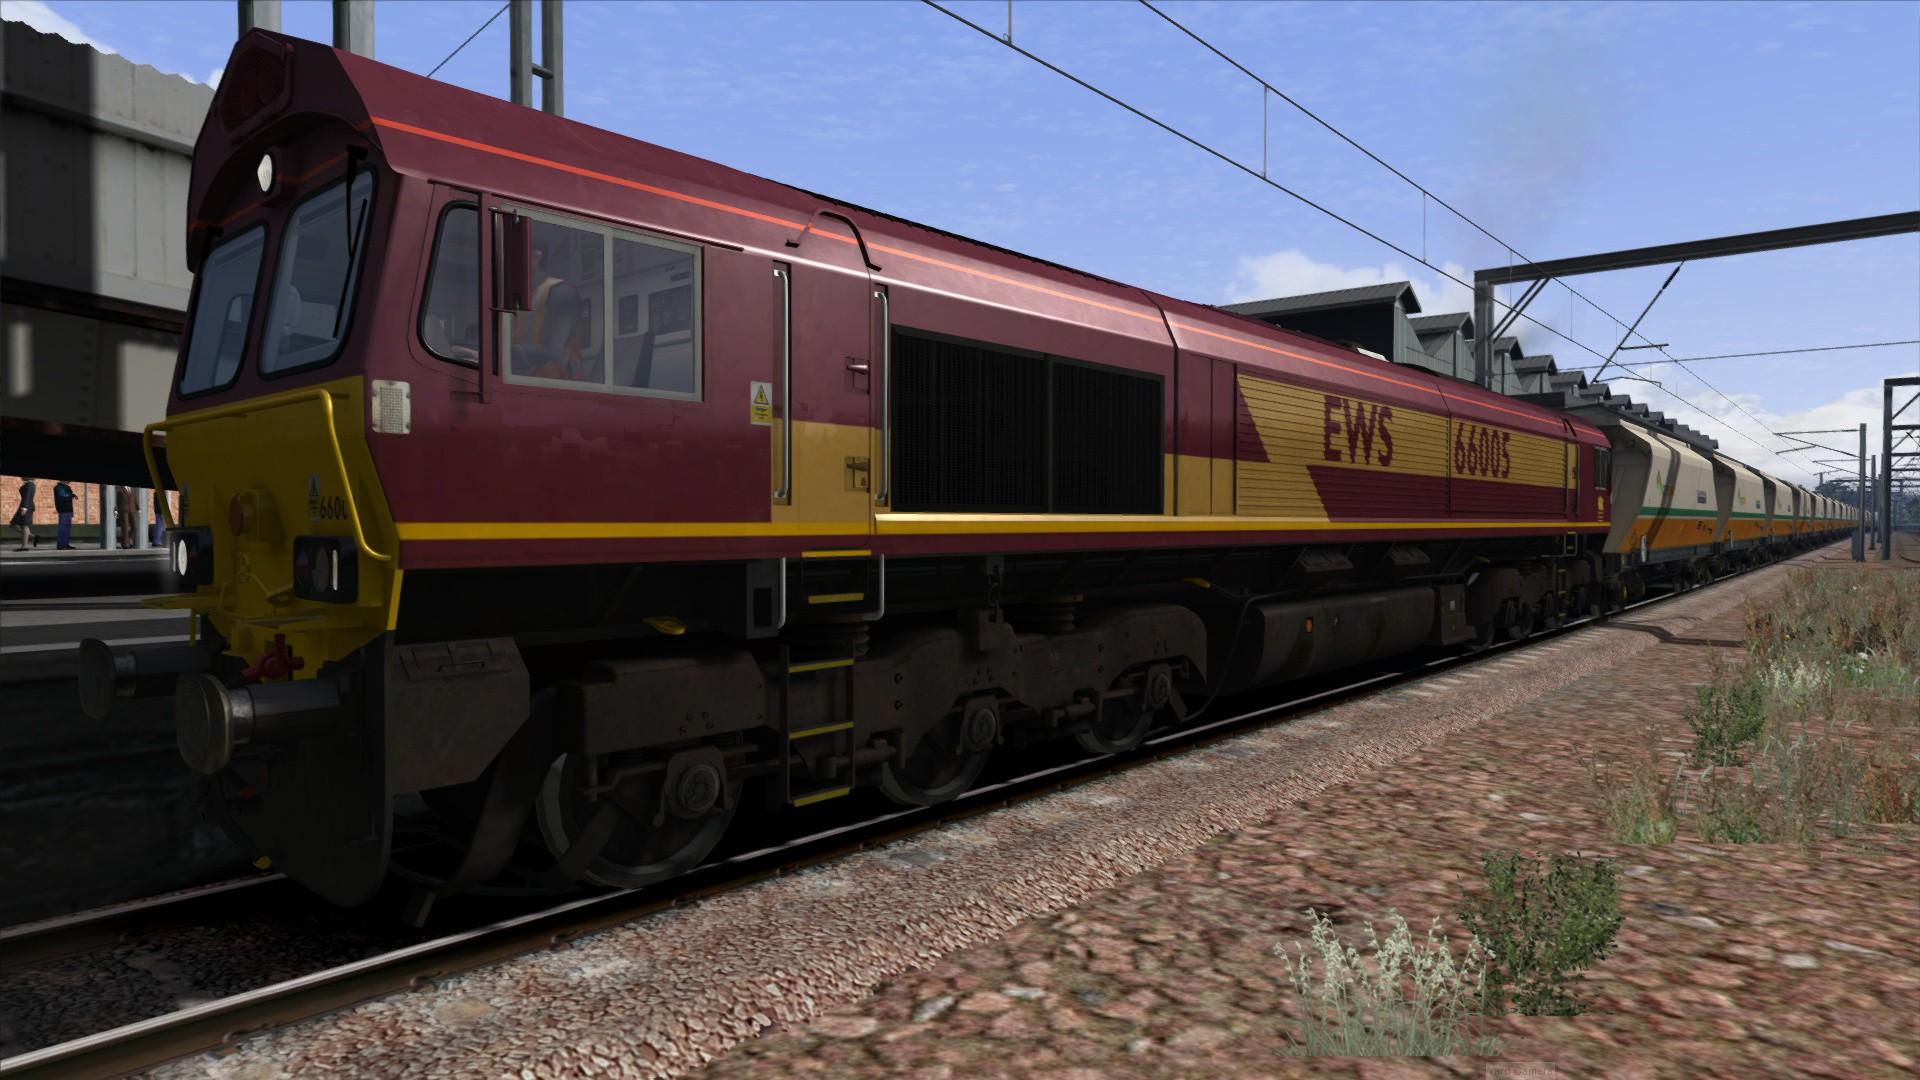 Train Simulator: EWS Class 66 v2.0 Loco Add-On screenshot